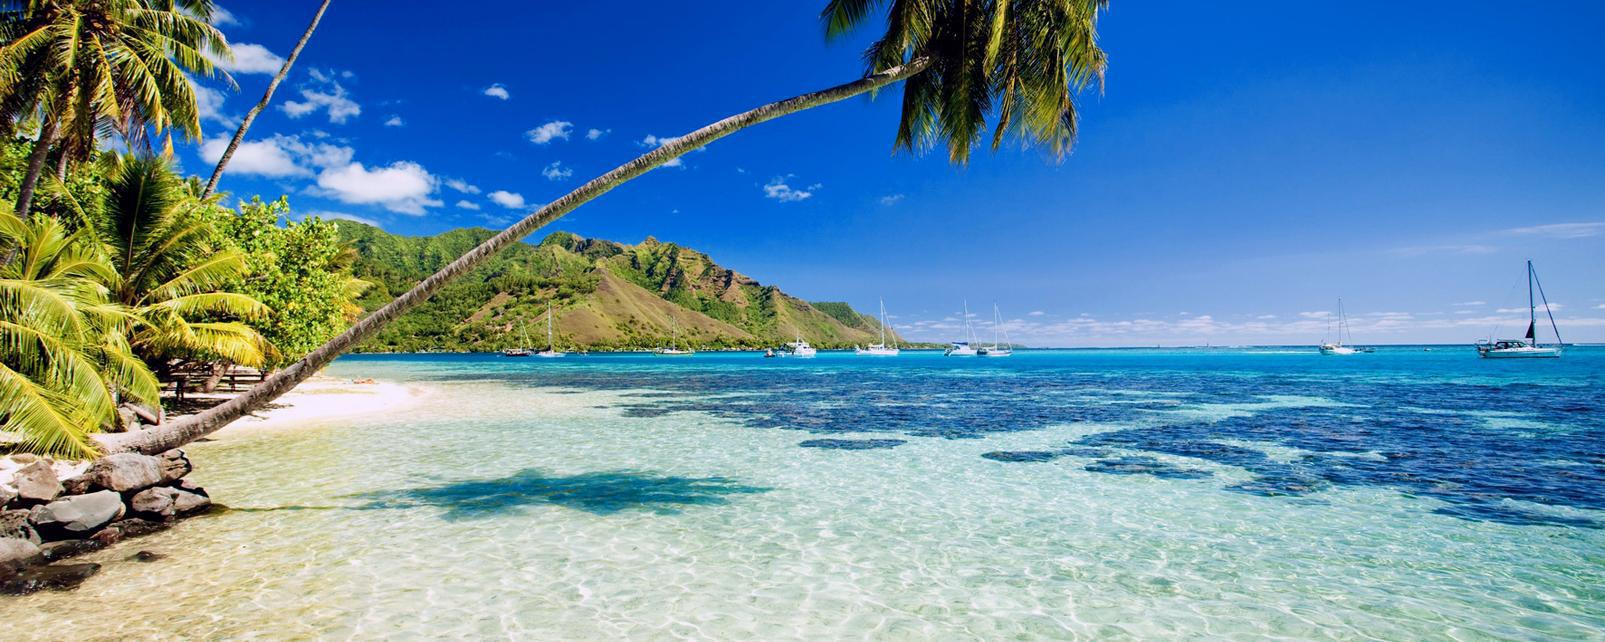 Océan Pacifique; Polynésie; Tahiti; Bora Bora; Moorea;